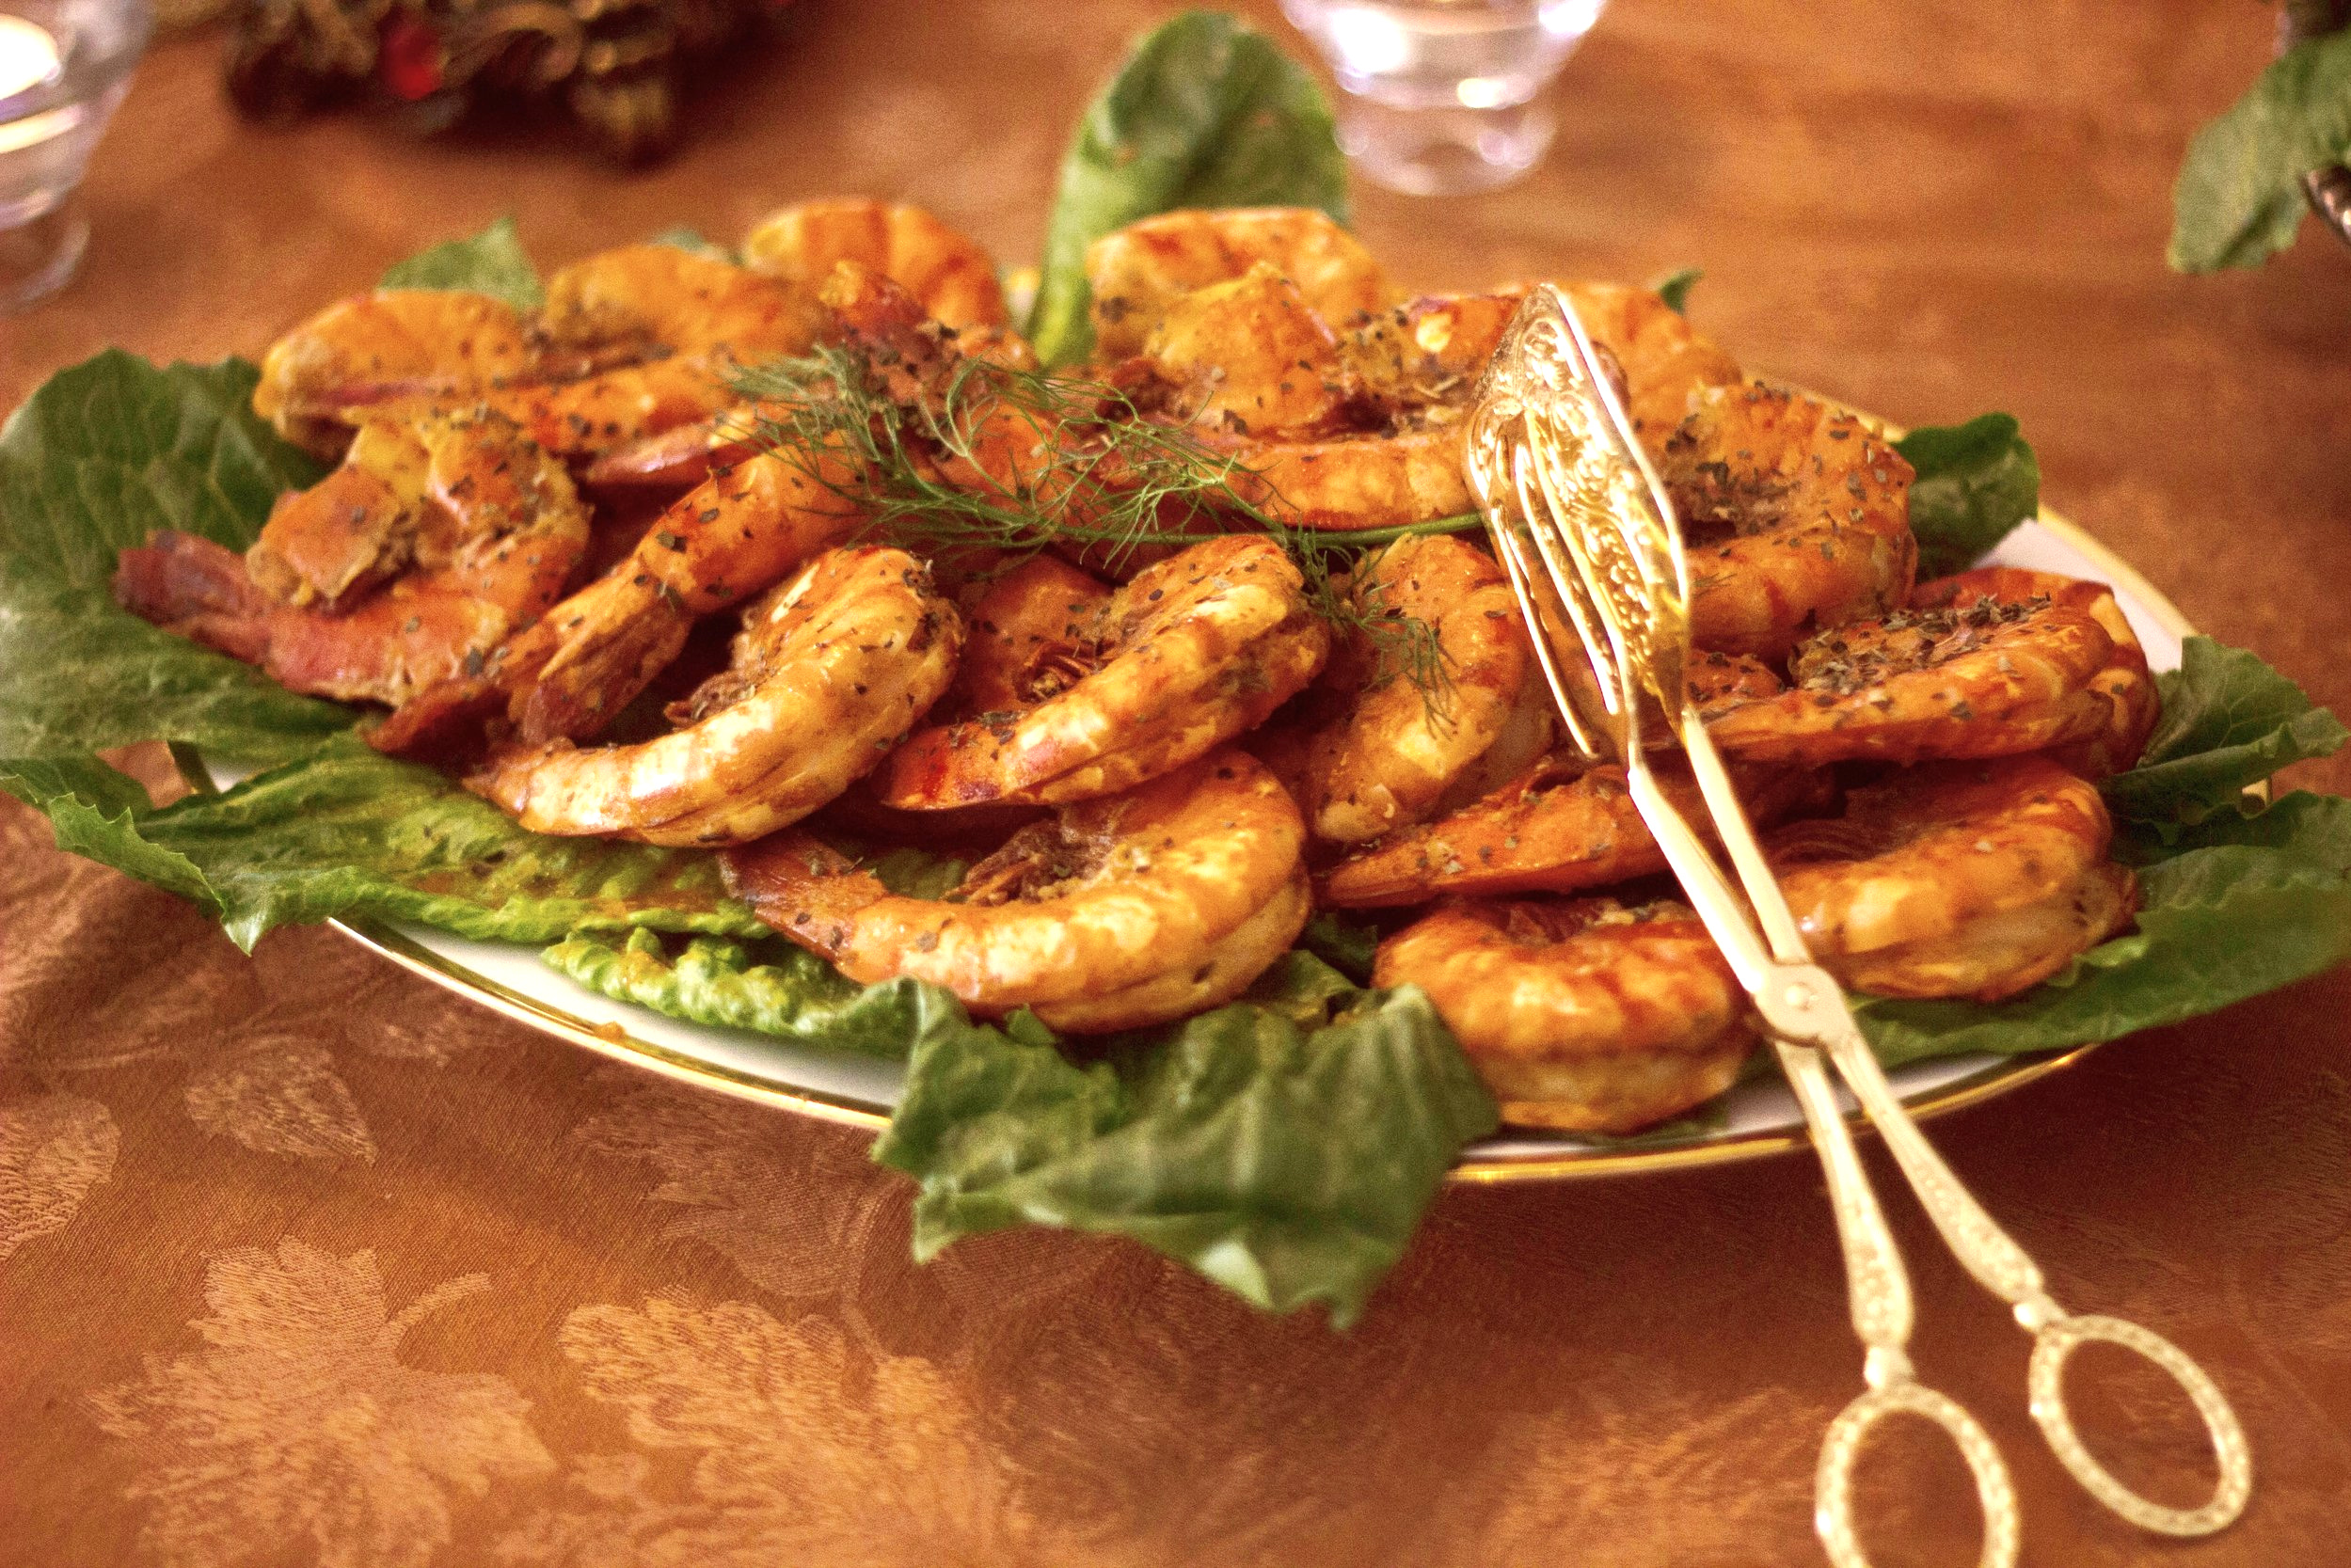 Mariby Corpening's Always Popular Lemon & Fresh Dill Broiled Shrimp